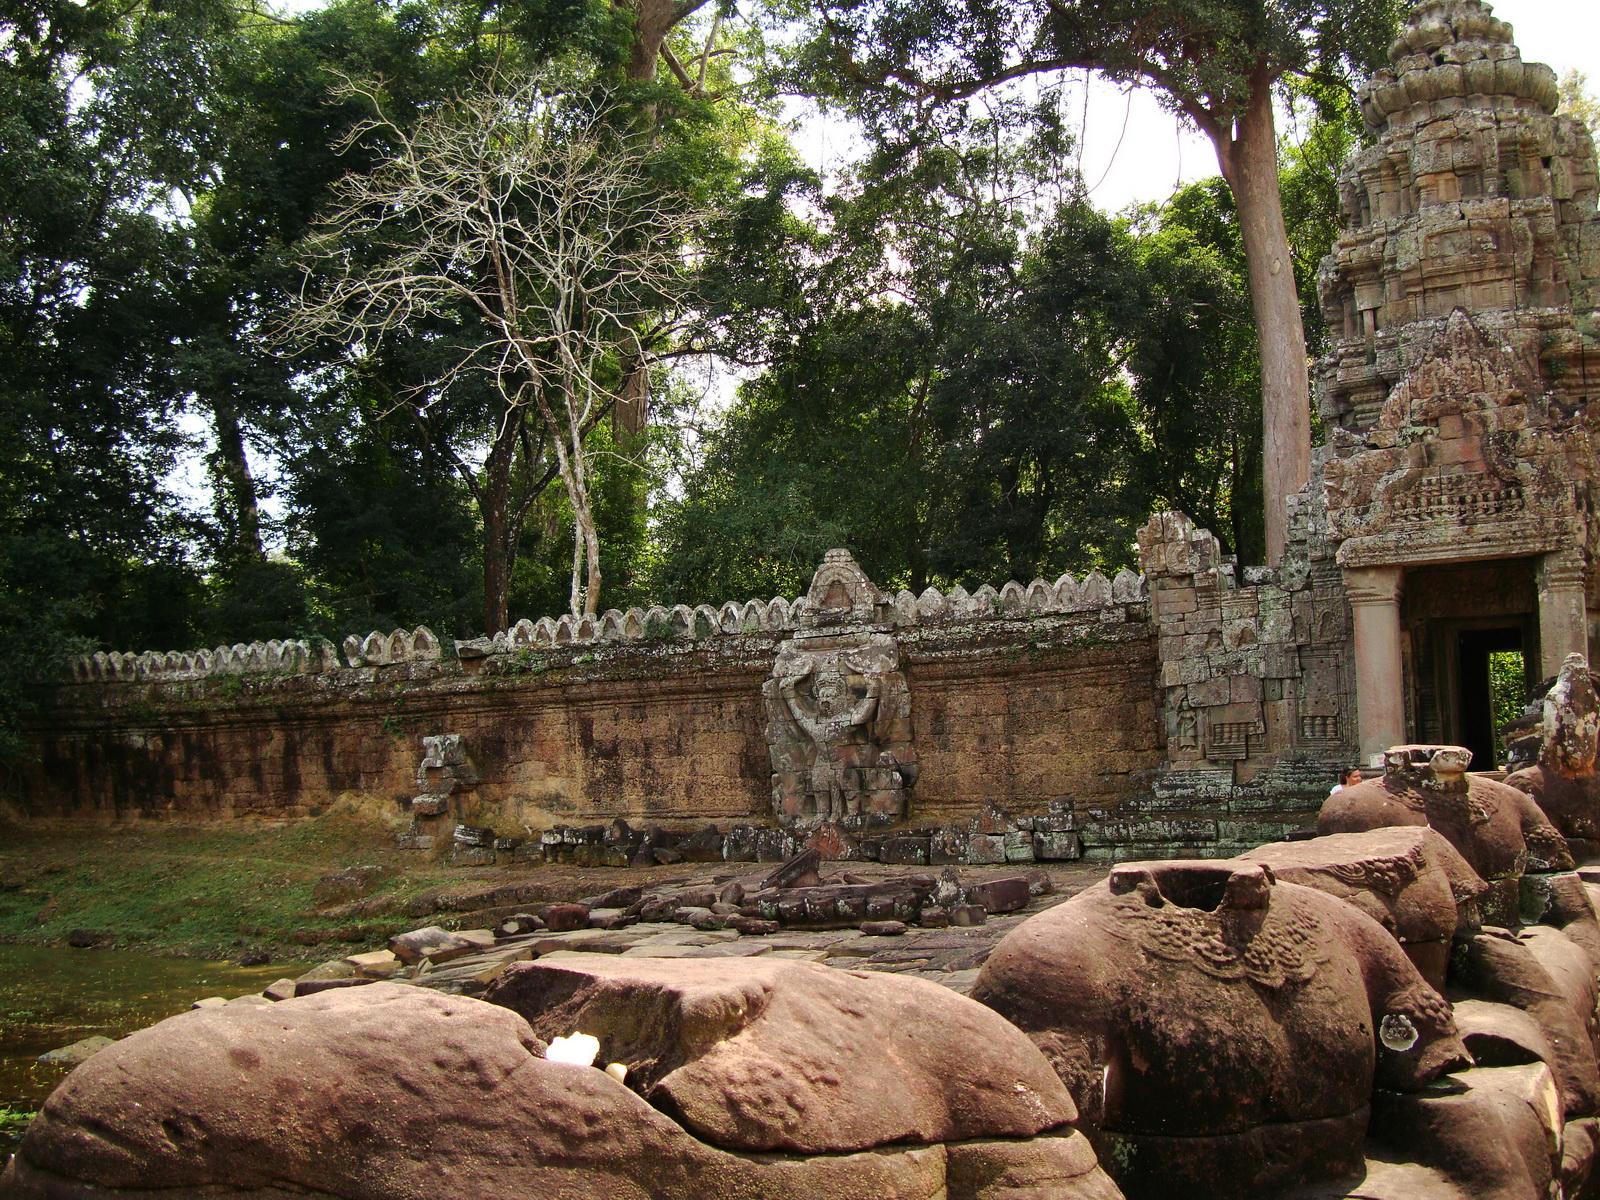 Preah Khan Temple 4th wall enclosure 5m Garuda holding Nagas 05